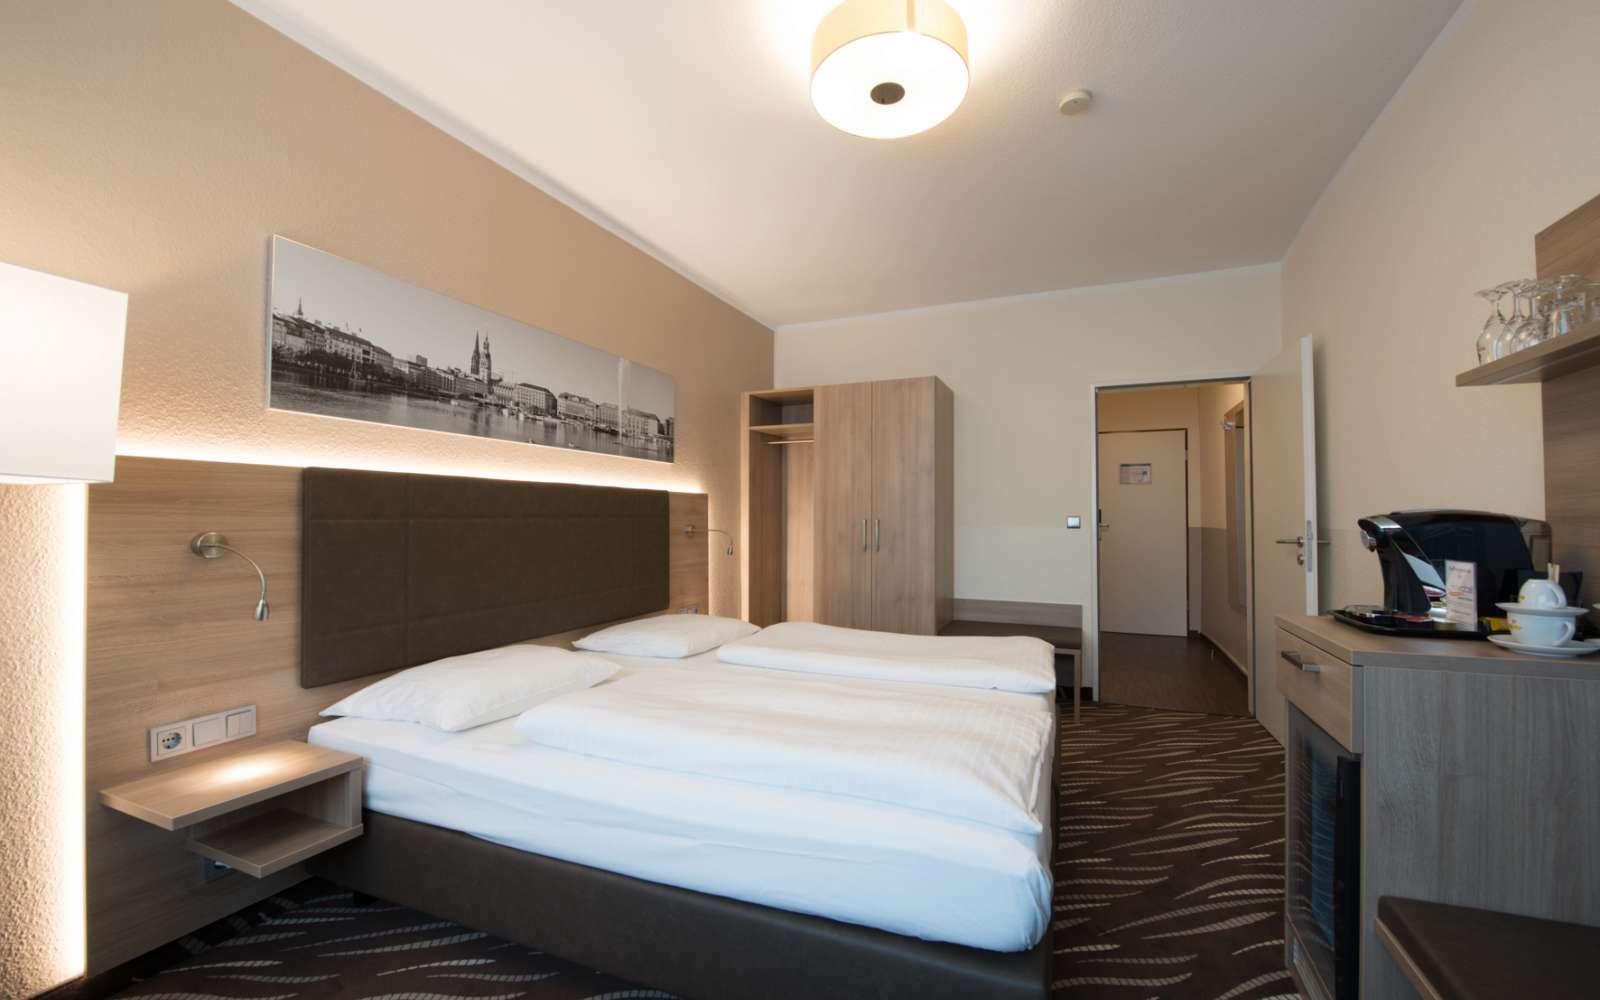 Full Size of Großes Bett Doppelzimmer Superior Hotel Stadtpark Residenz Heikotel Kopfteil 140 Mit Matratze Box Spring 90x200 Weiß Massivholz Betten Tojo 200x220 180x200 Bett Großes Bett